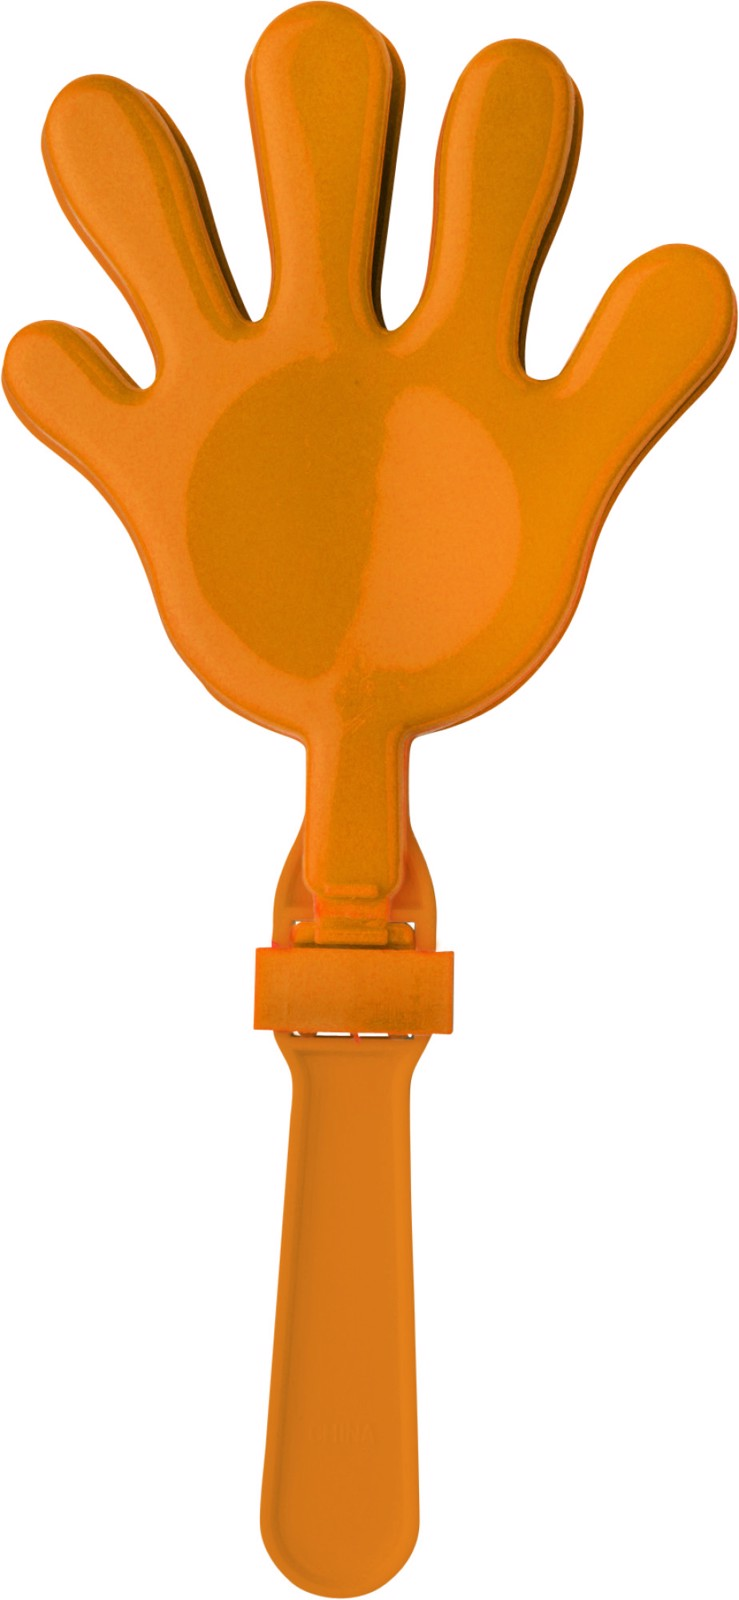 PP hand clapper - Orange